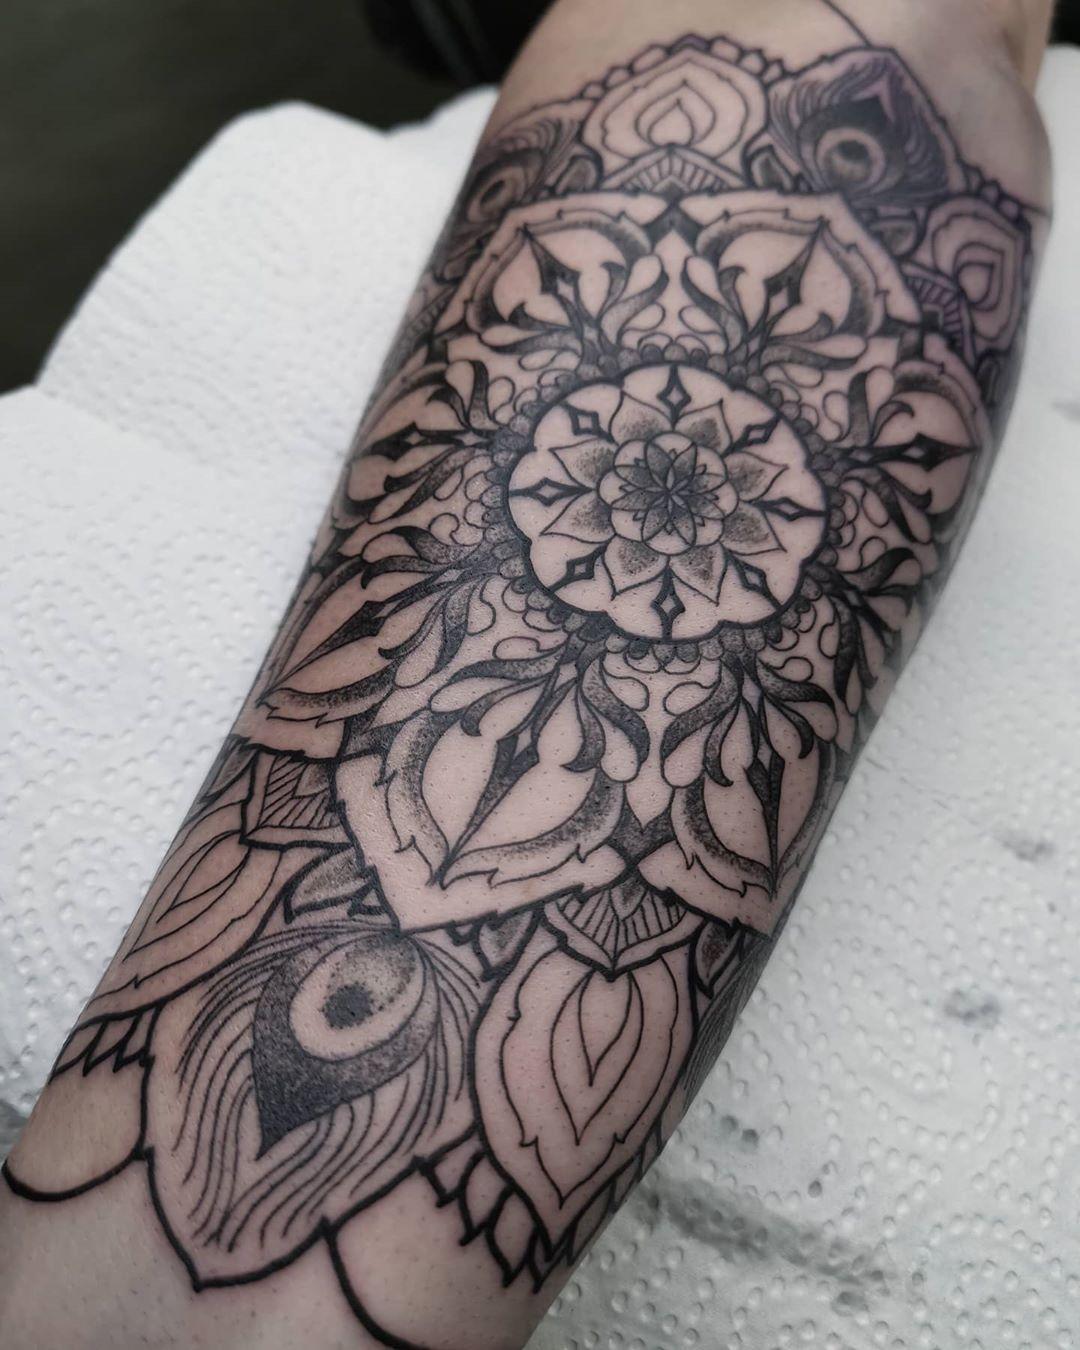 Another mandala, not all the way done, start of a half sleeve  #cgn #blackwork  #tattoo #tattooflash #germantattoers #tattoosketch  #blackworkers #dotwork #ornamental #mndala #taot #neotraditional#thenewtraditionalists #tätowiermagazin #tattookulturemagazine #tattooing #newtrad #topclasstattooing #nxtlvltattoo #ninemag #supportgoodtattooers #instaink #instatattoo #tttism #tattoocollectors #txttooing #germantattoers  #flashaddicted #powerhousetattookoeln